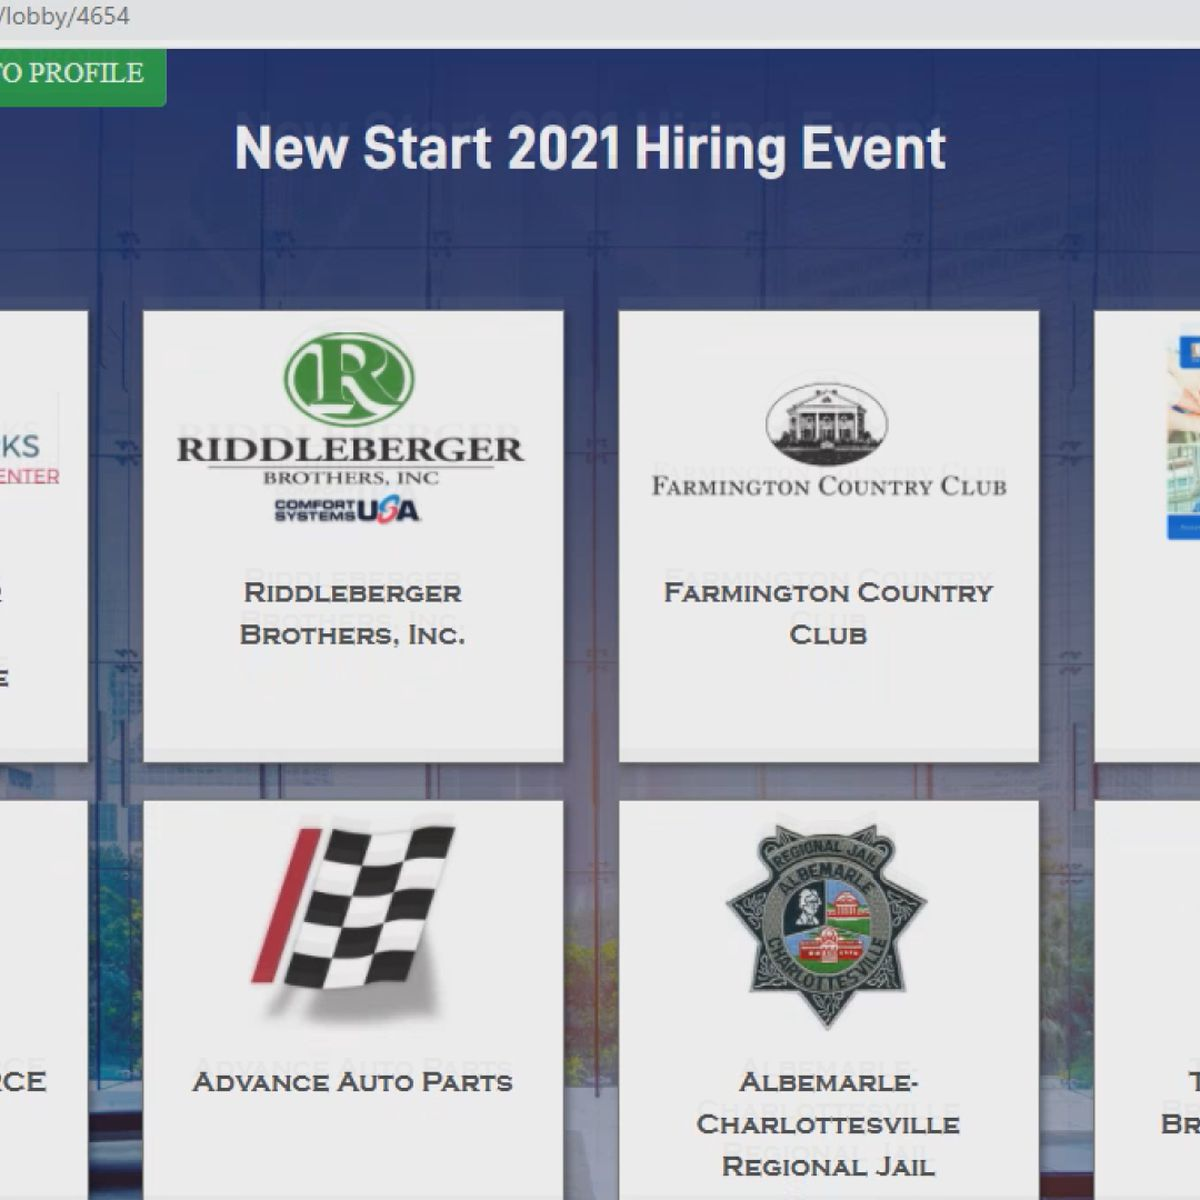 Virtual job fair held in Charlottesville